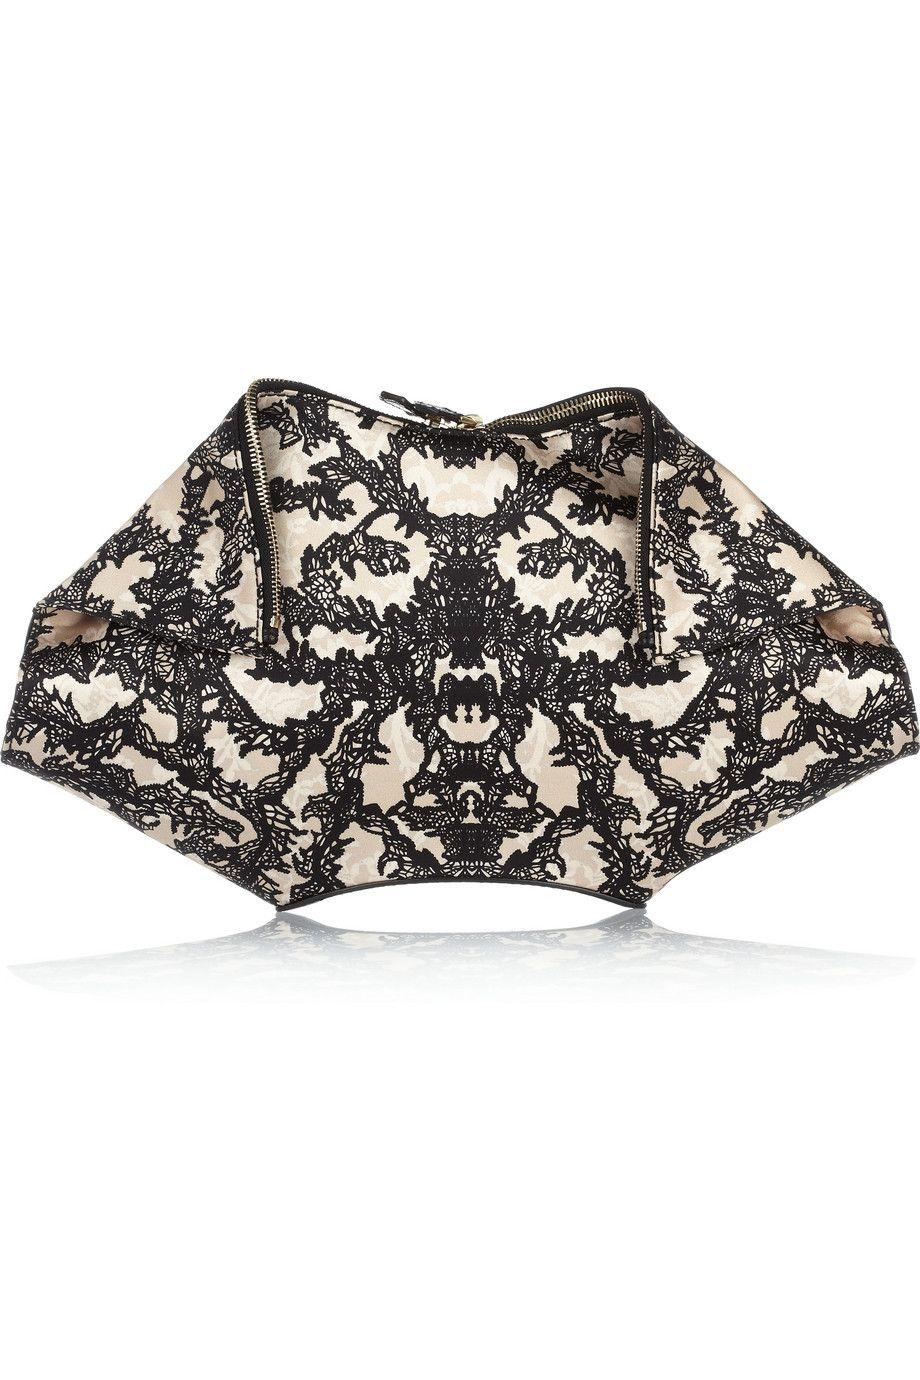 Alexander McQueen - De Manta lace-print satin clutch